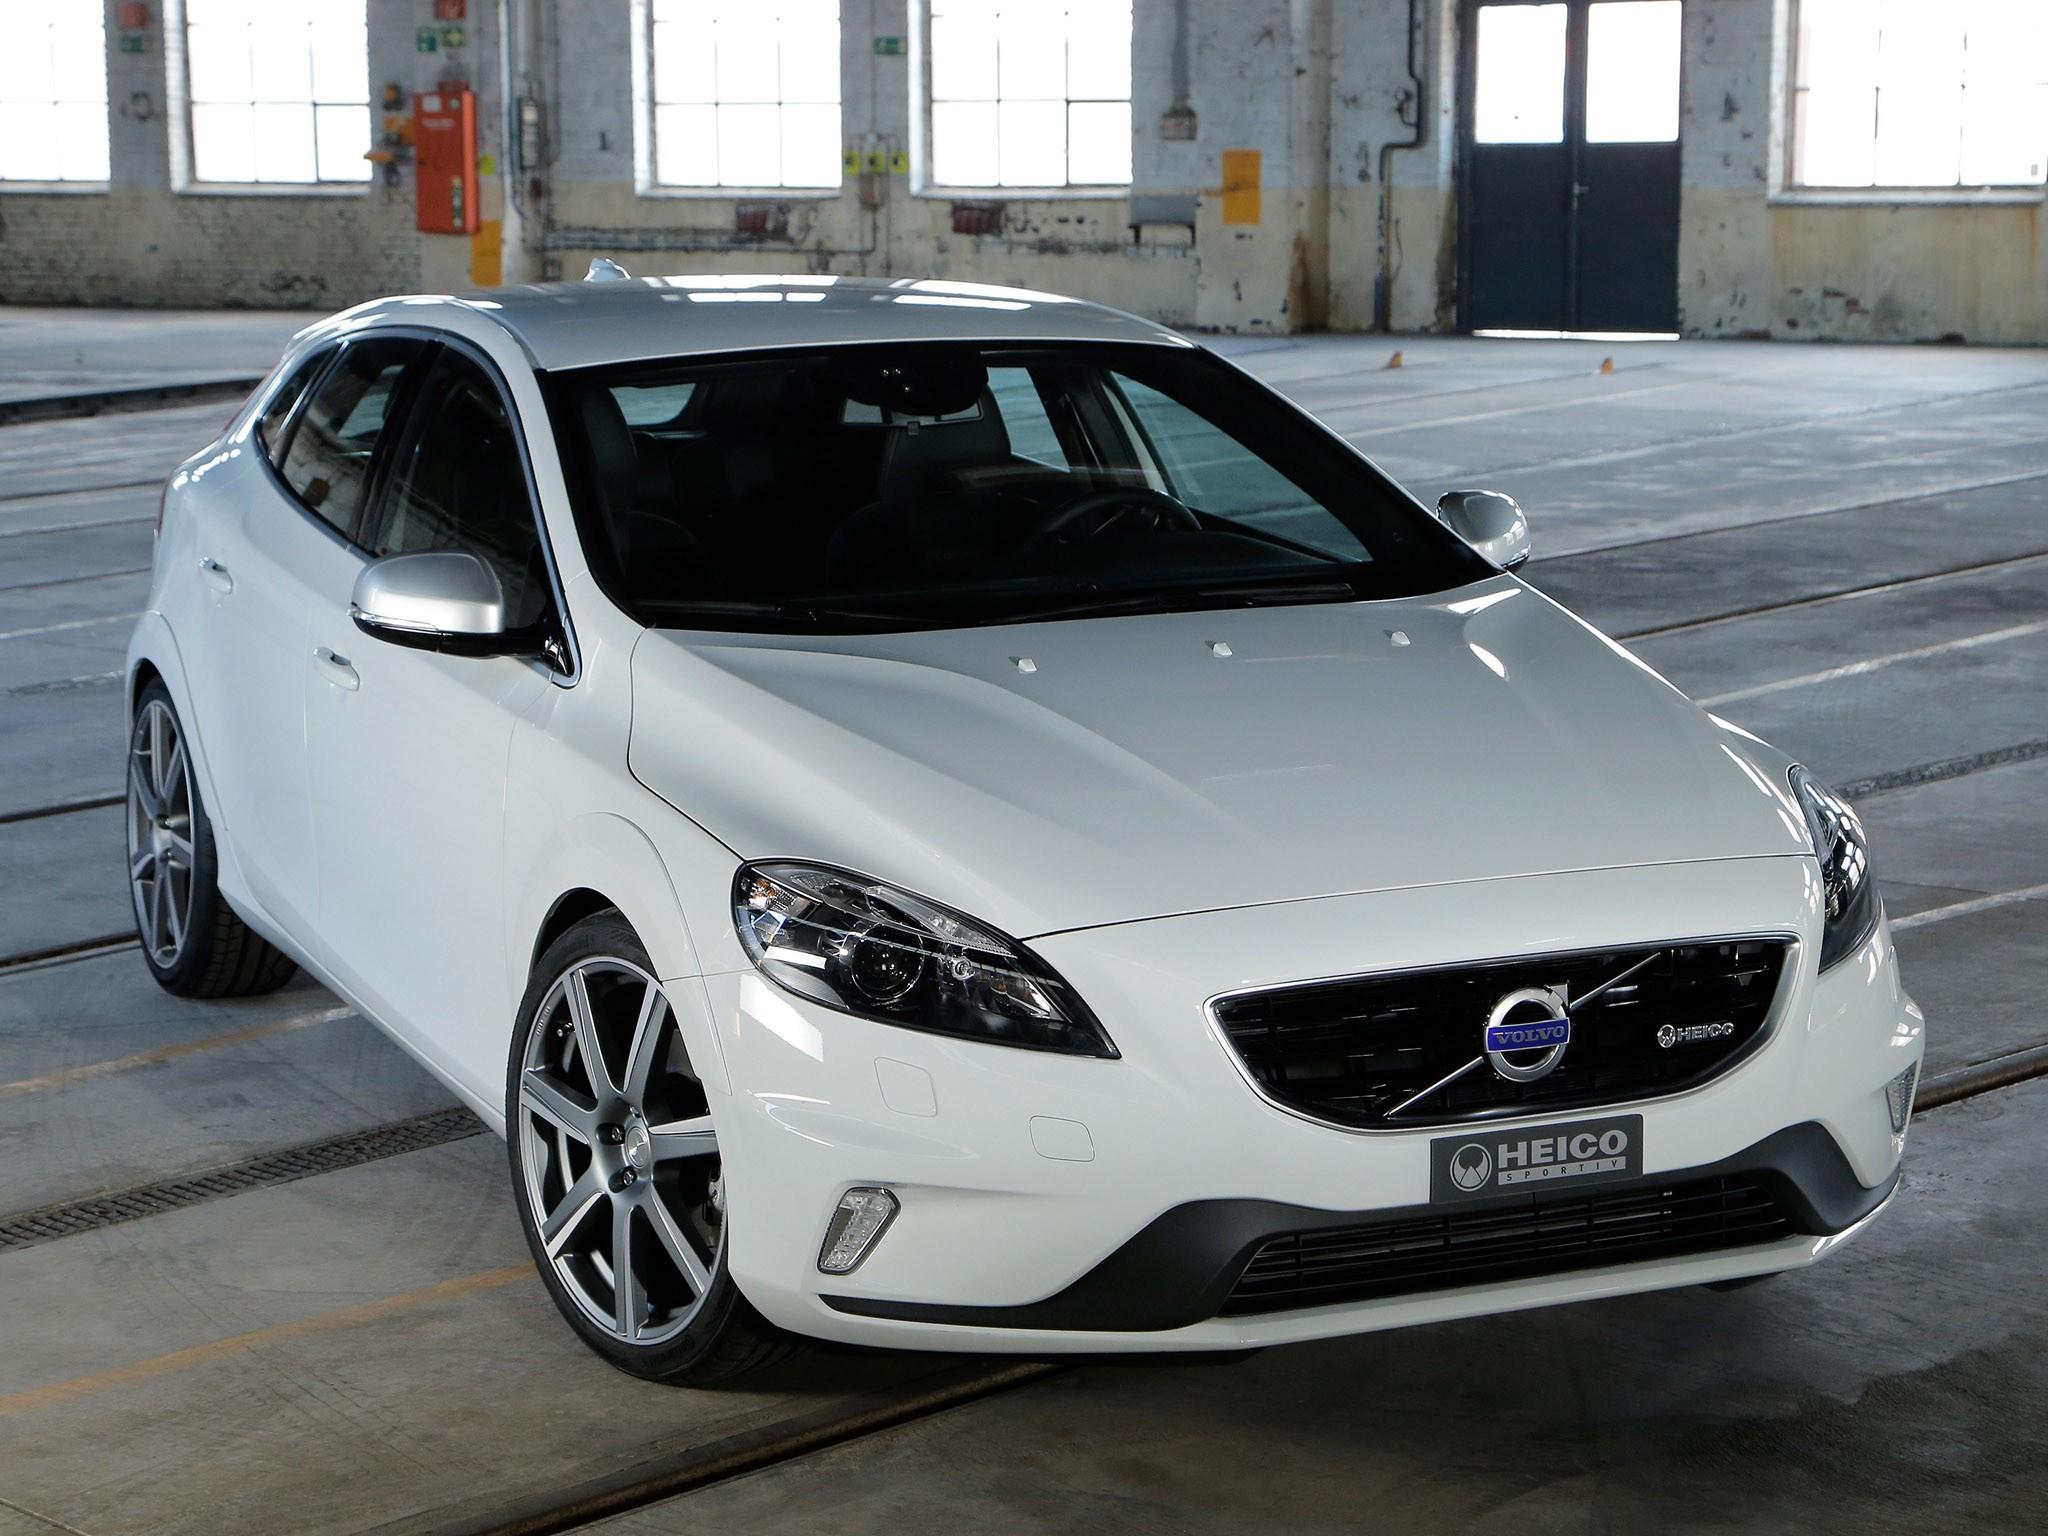 2014 Heico Sportiv - Volvo V40 R-Design